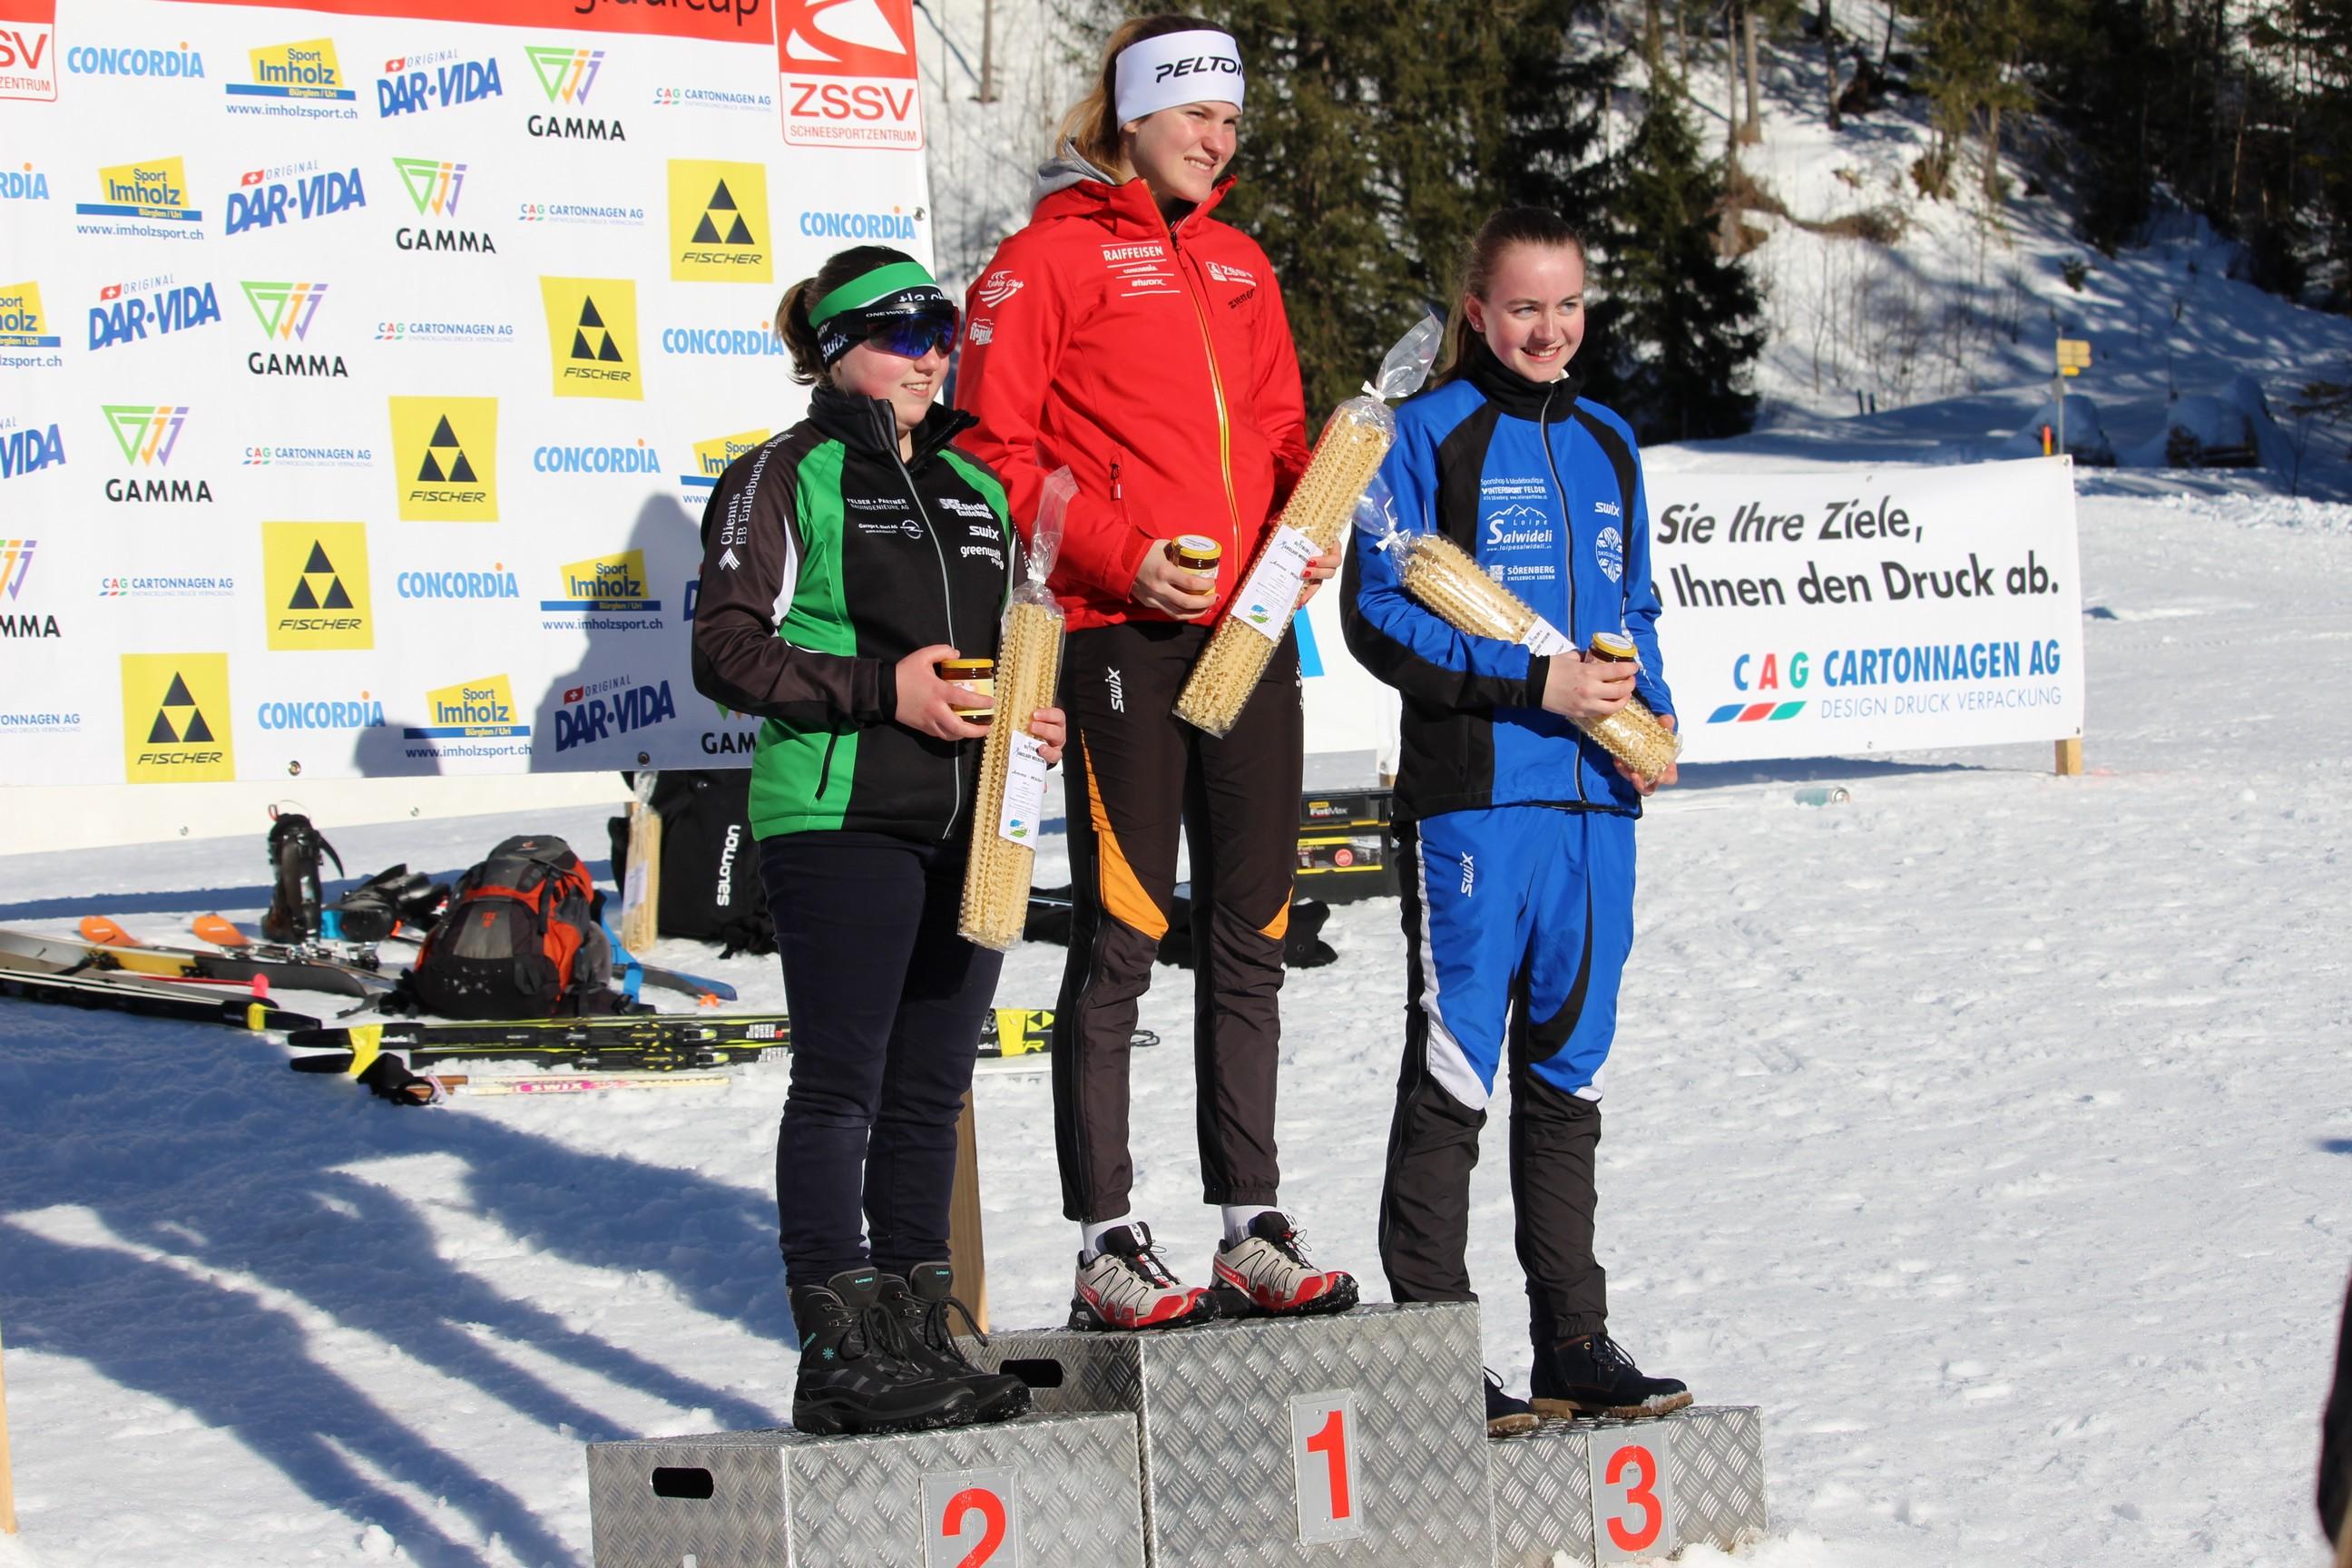 2019.02.17 - Salwideli LL Cup - Sörenberg